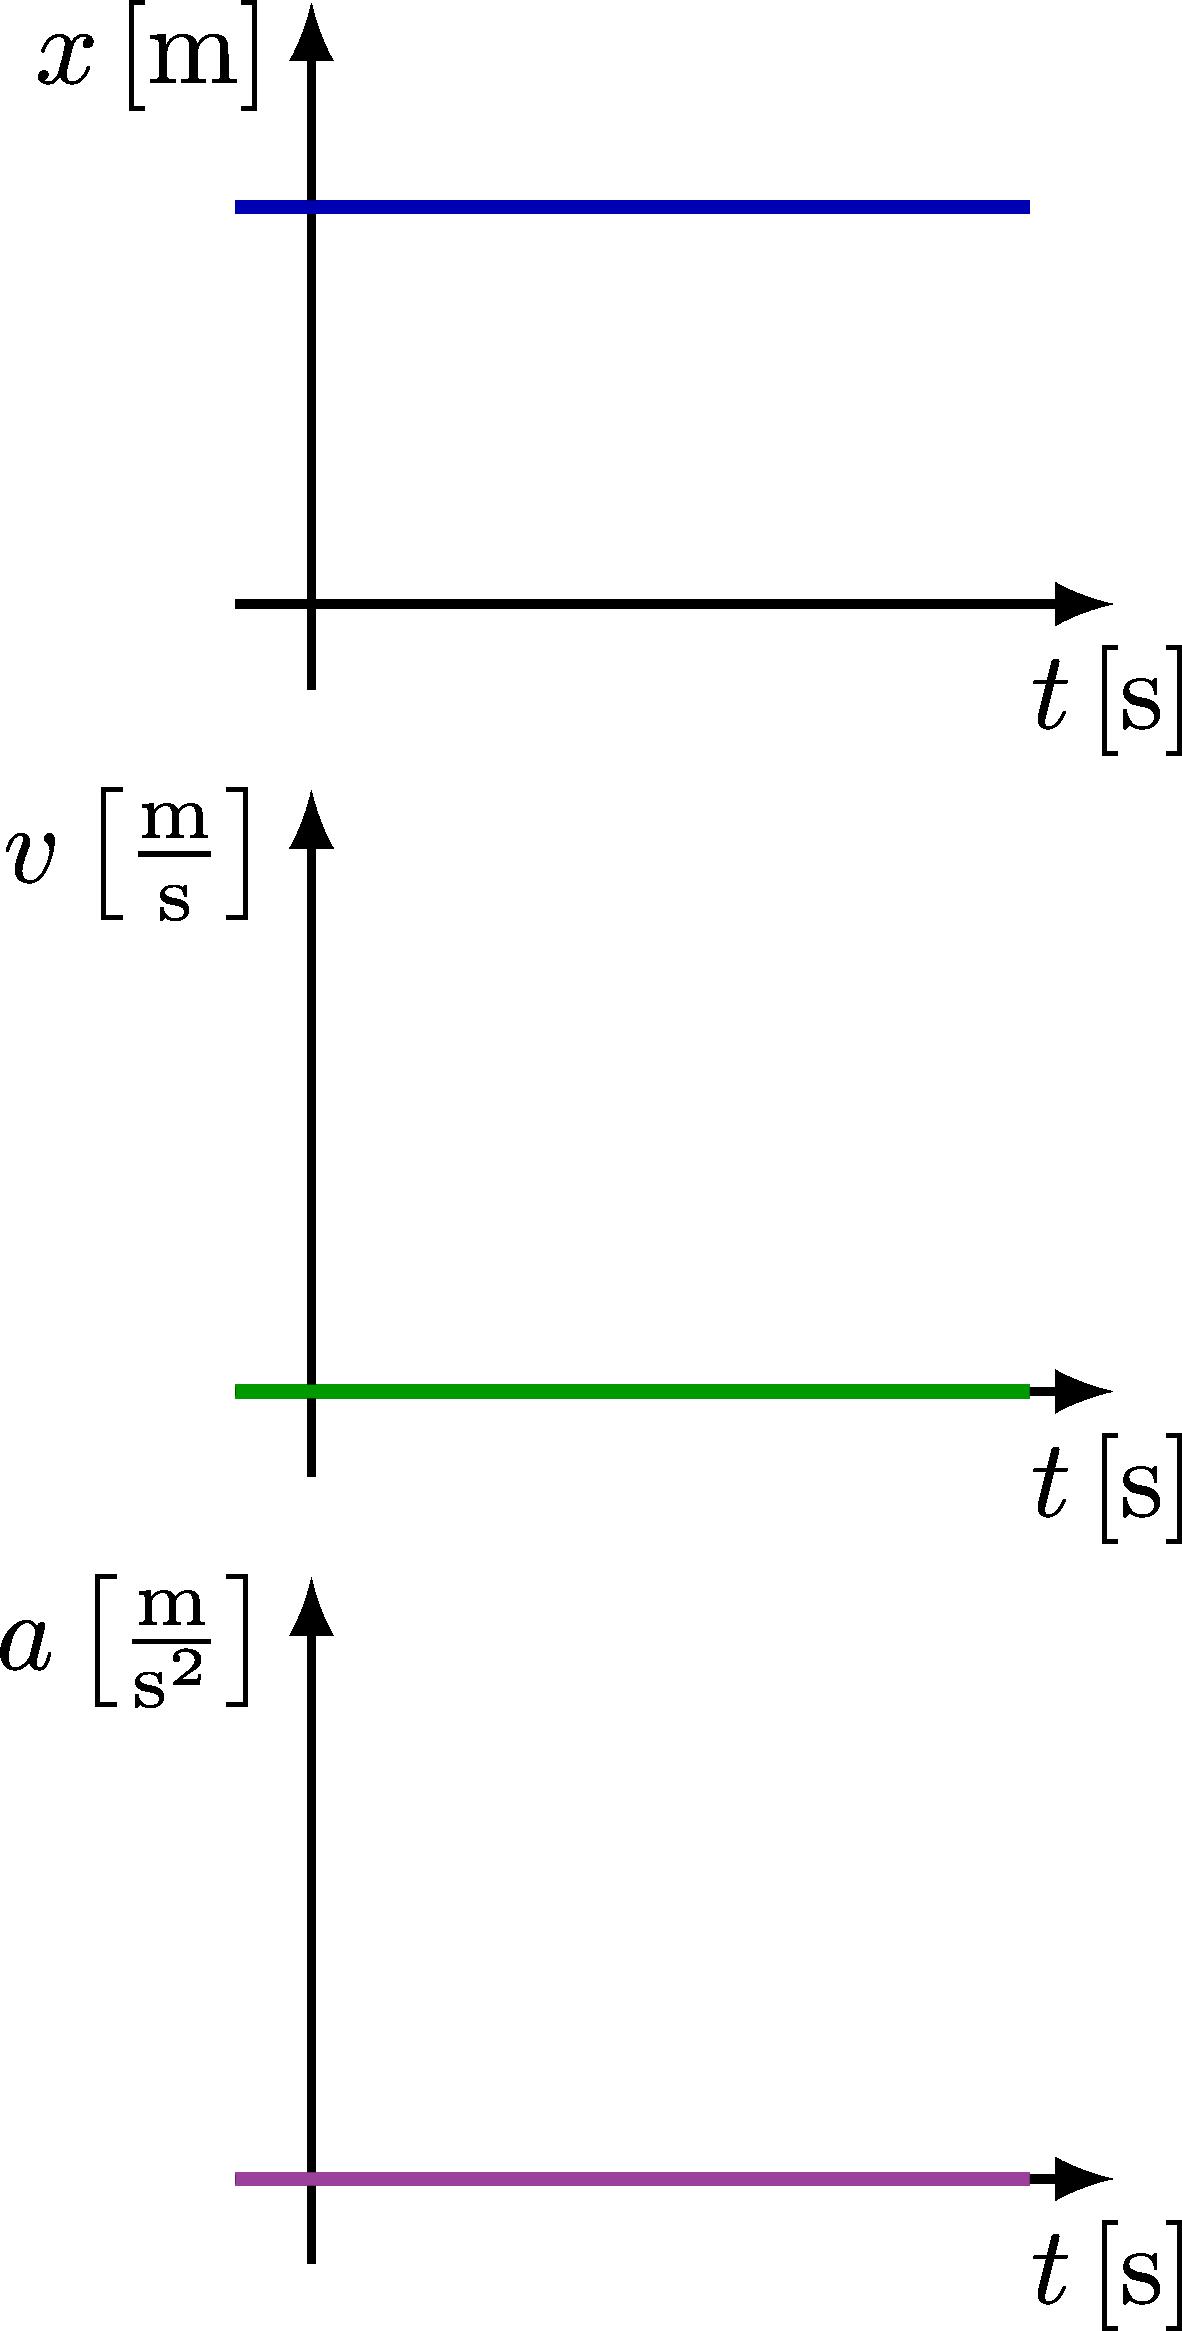 kinematics_curves_xva-001.png